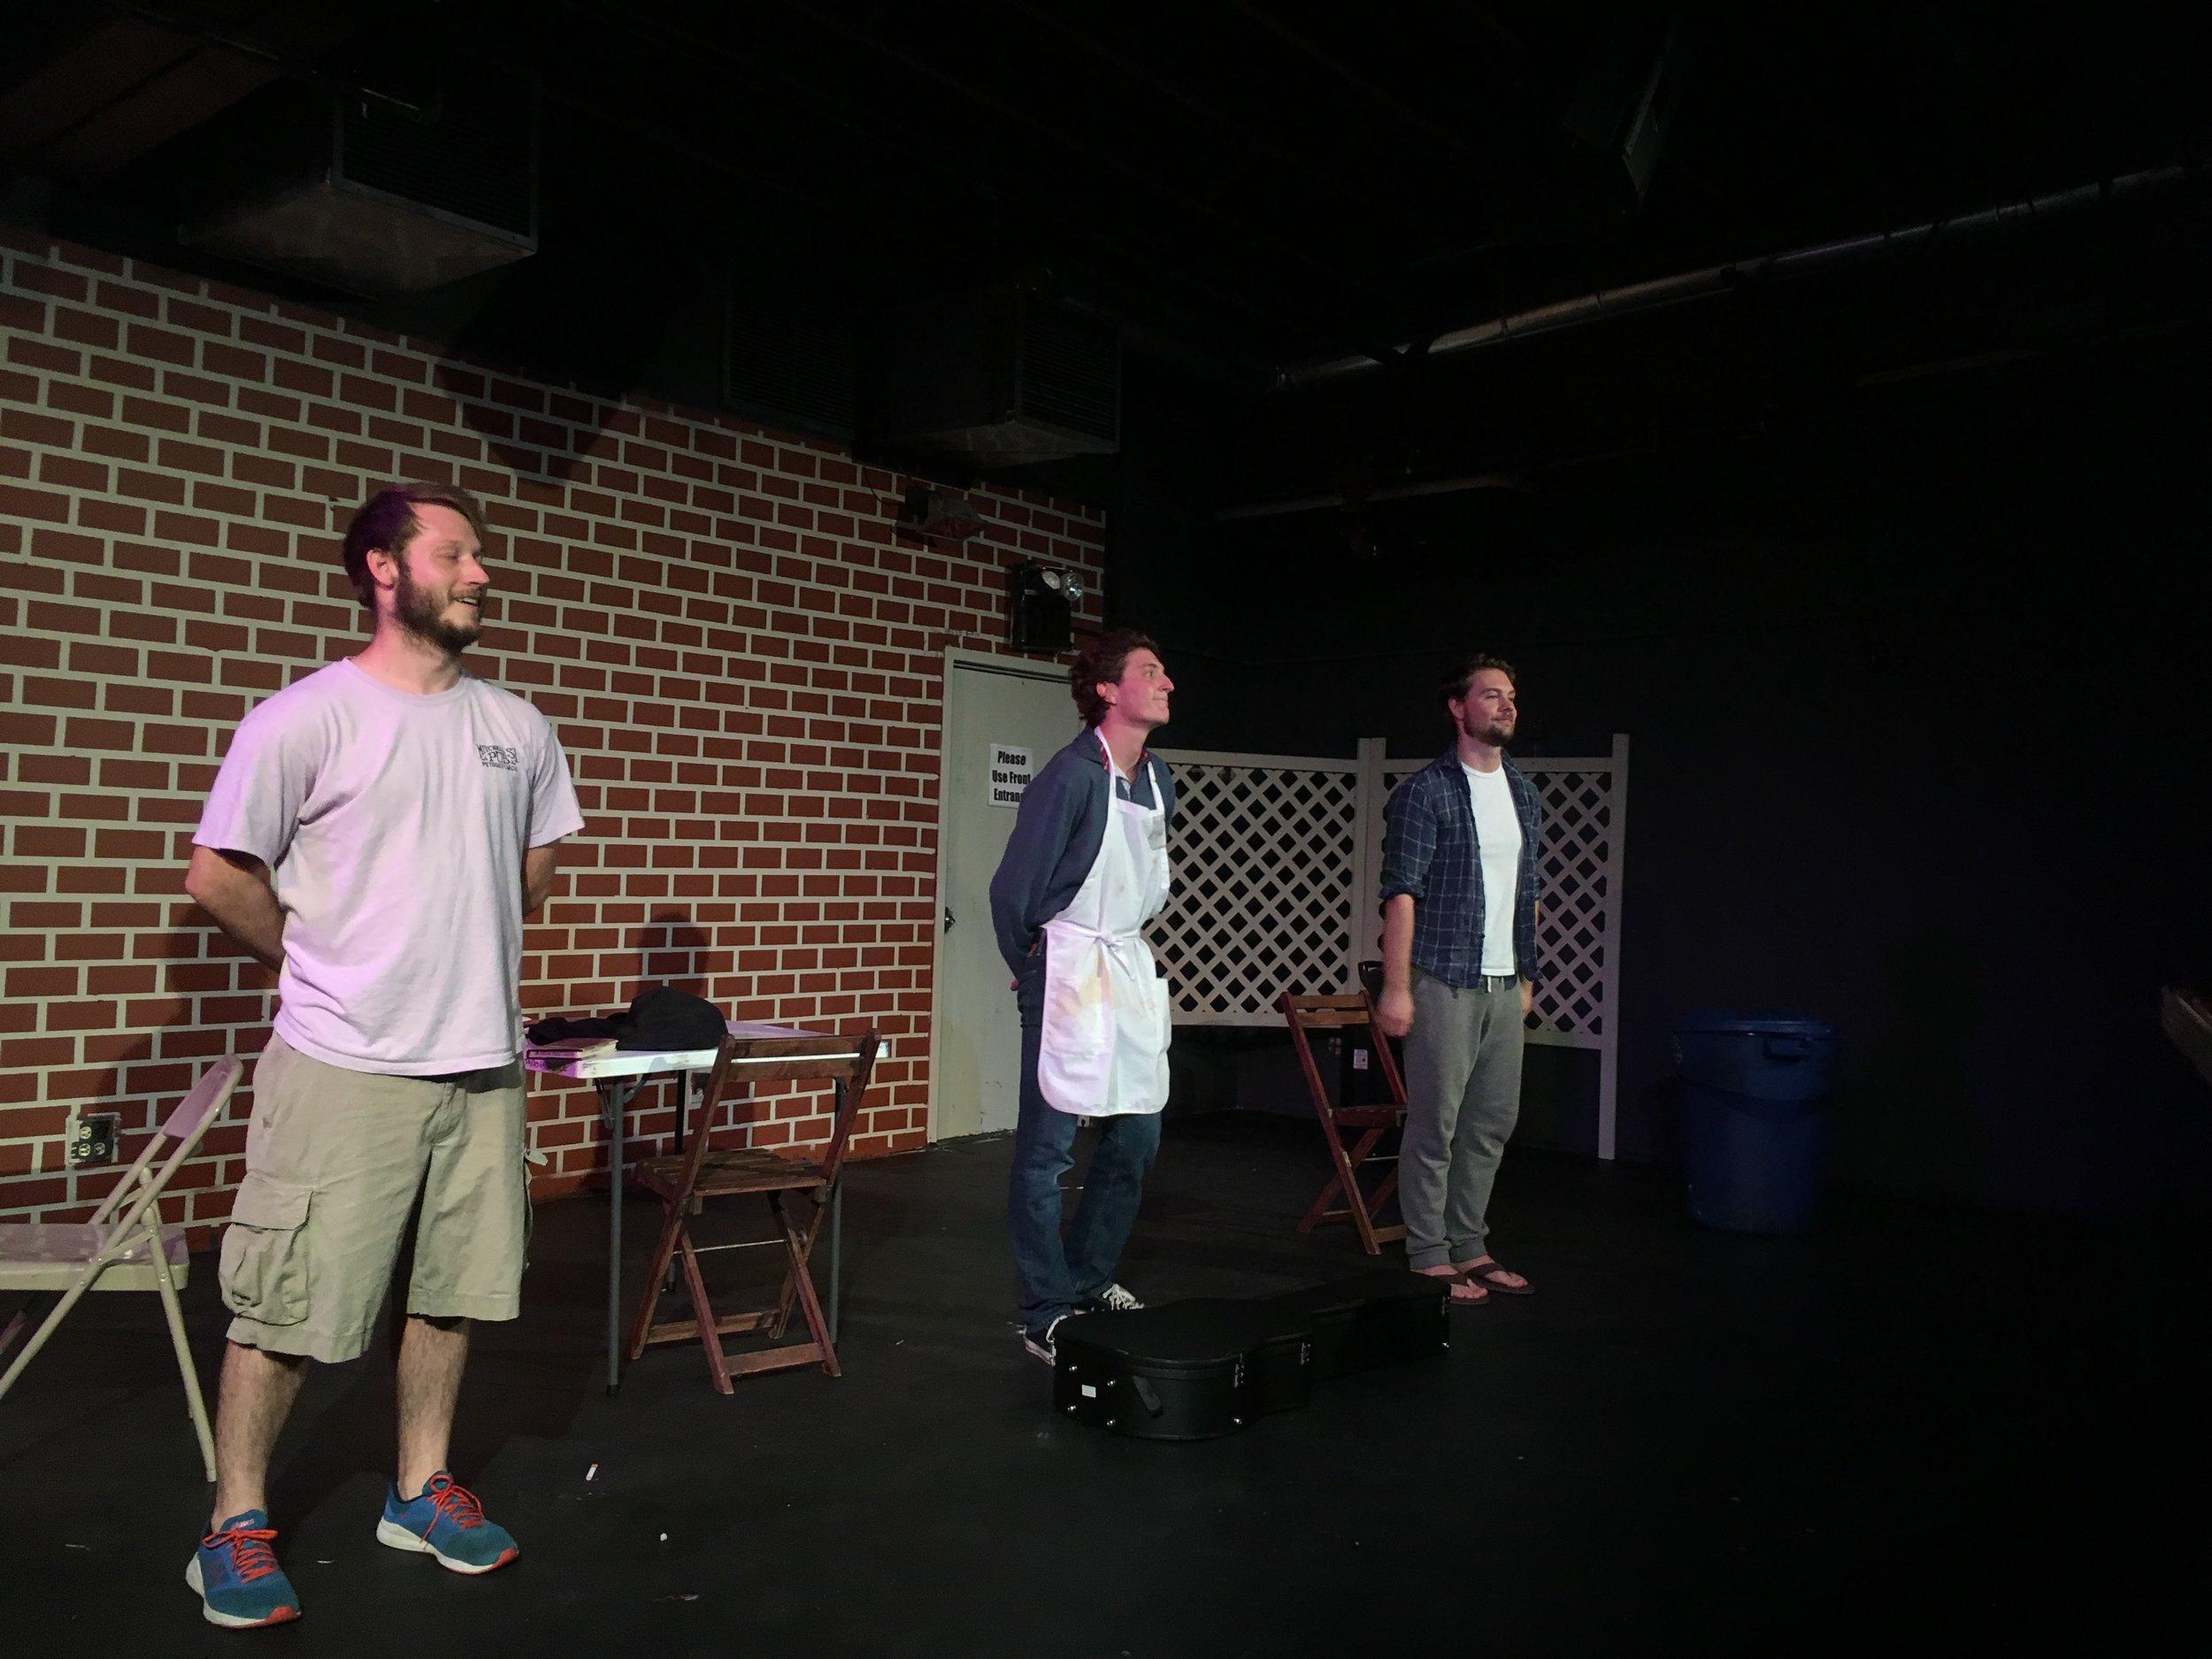 L2R Miles Potter as KJ, Griffin Johnston as Evan, and Peter Giessl as Jasper